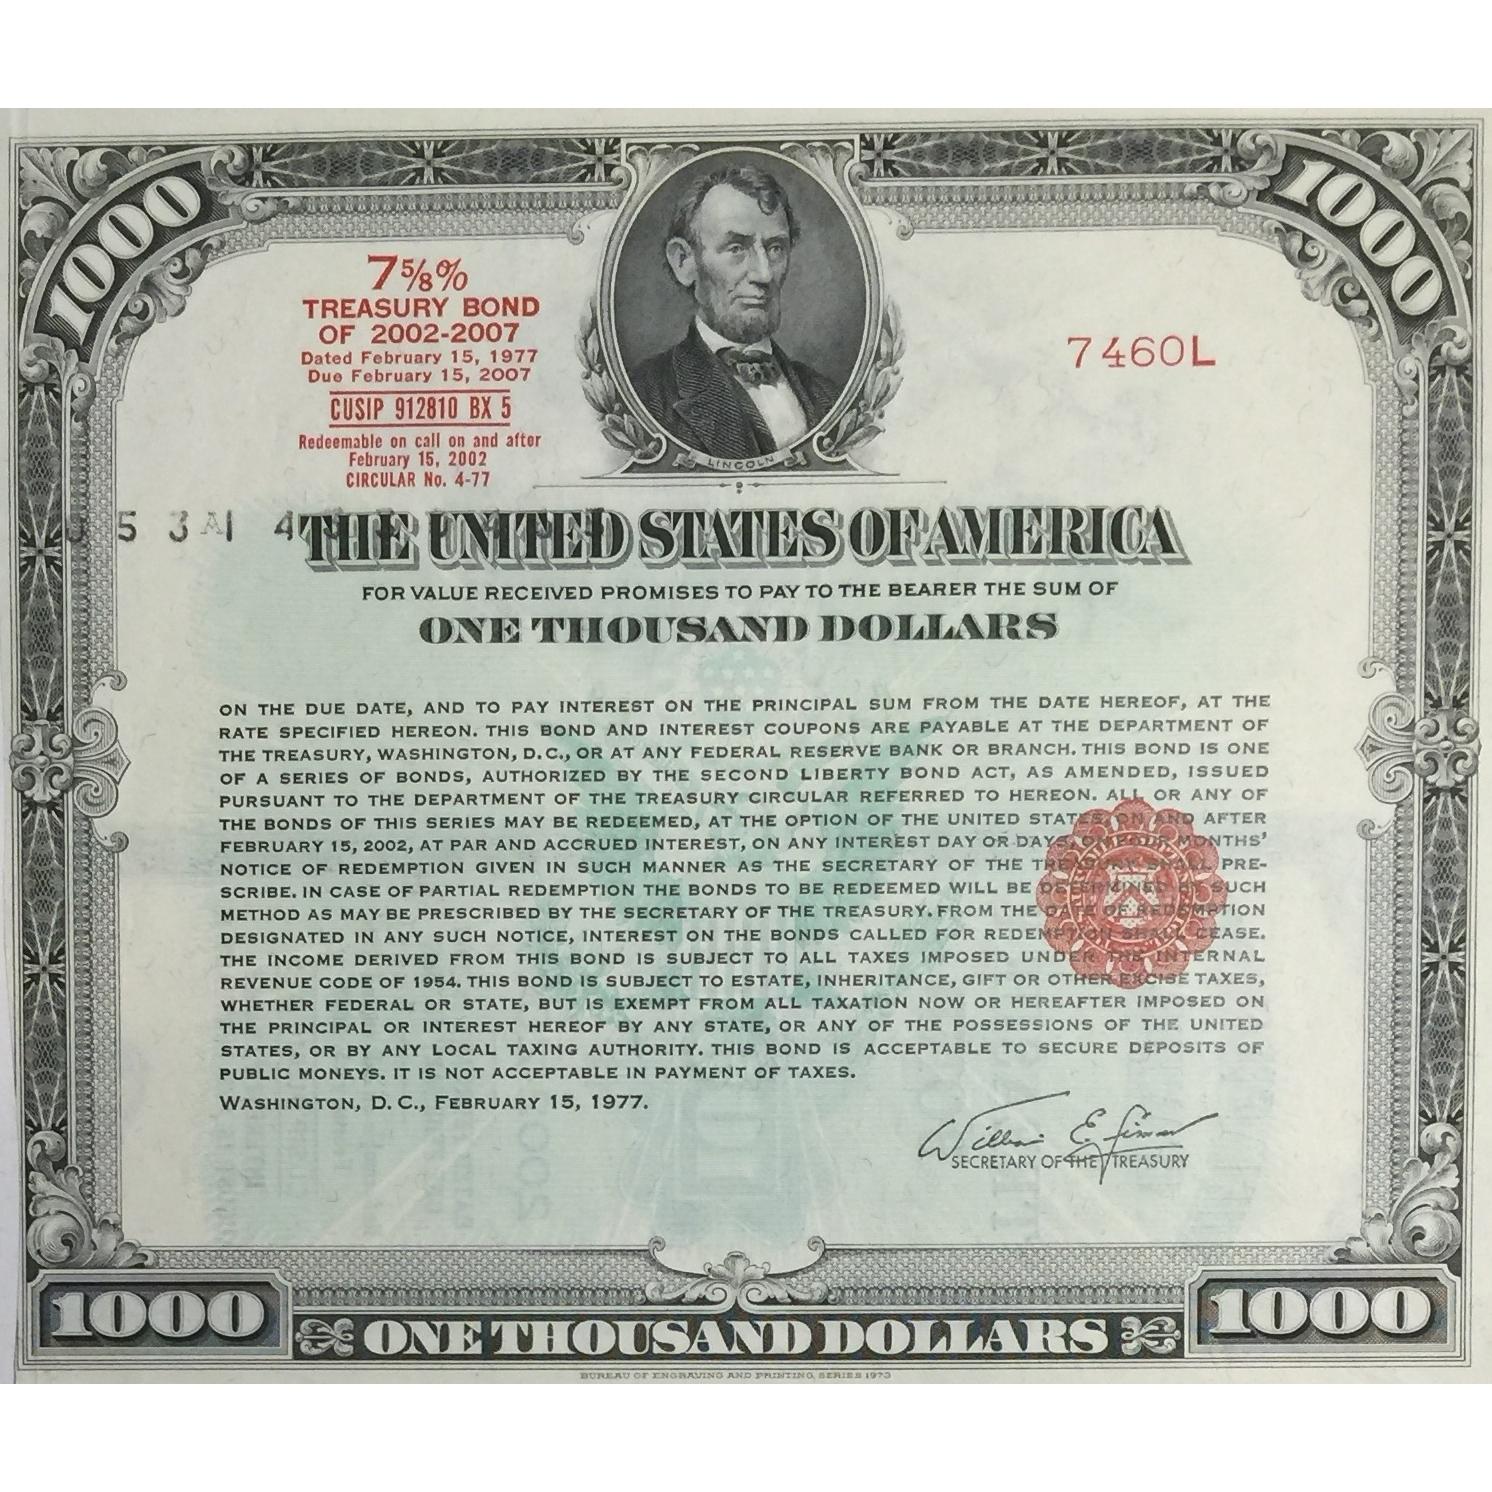 26) 1890 Columbus Shawnee and Hocking Railway Company $1,000